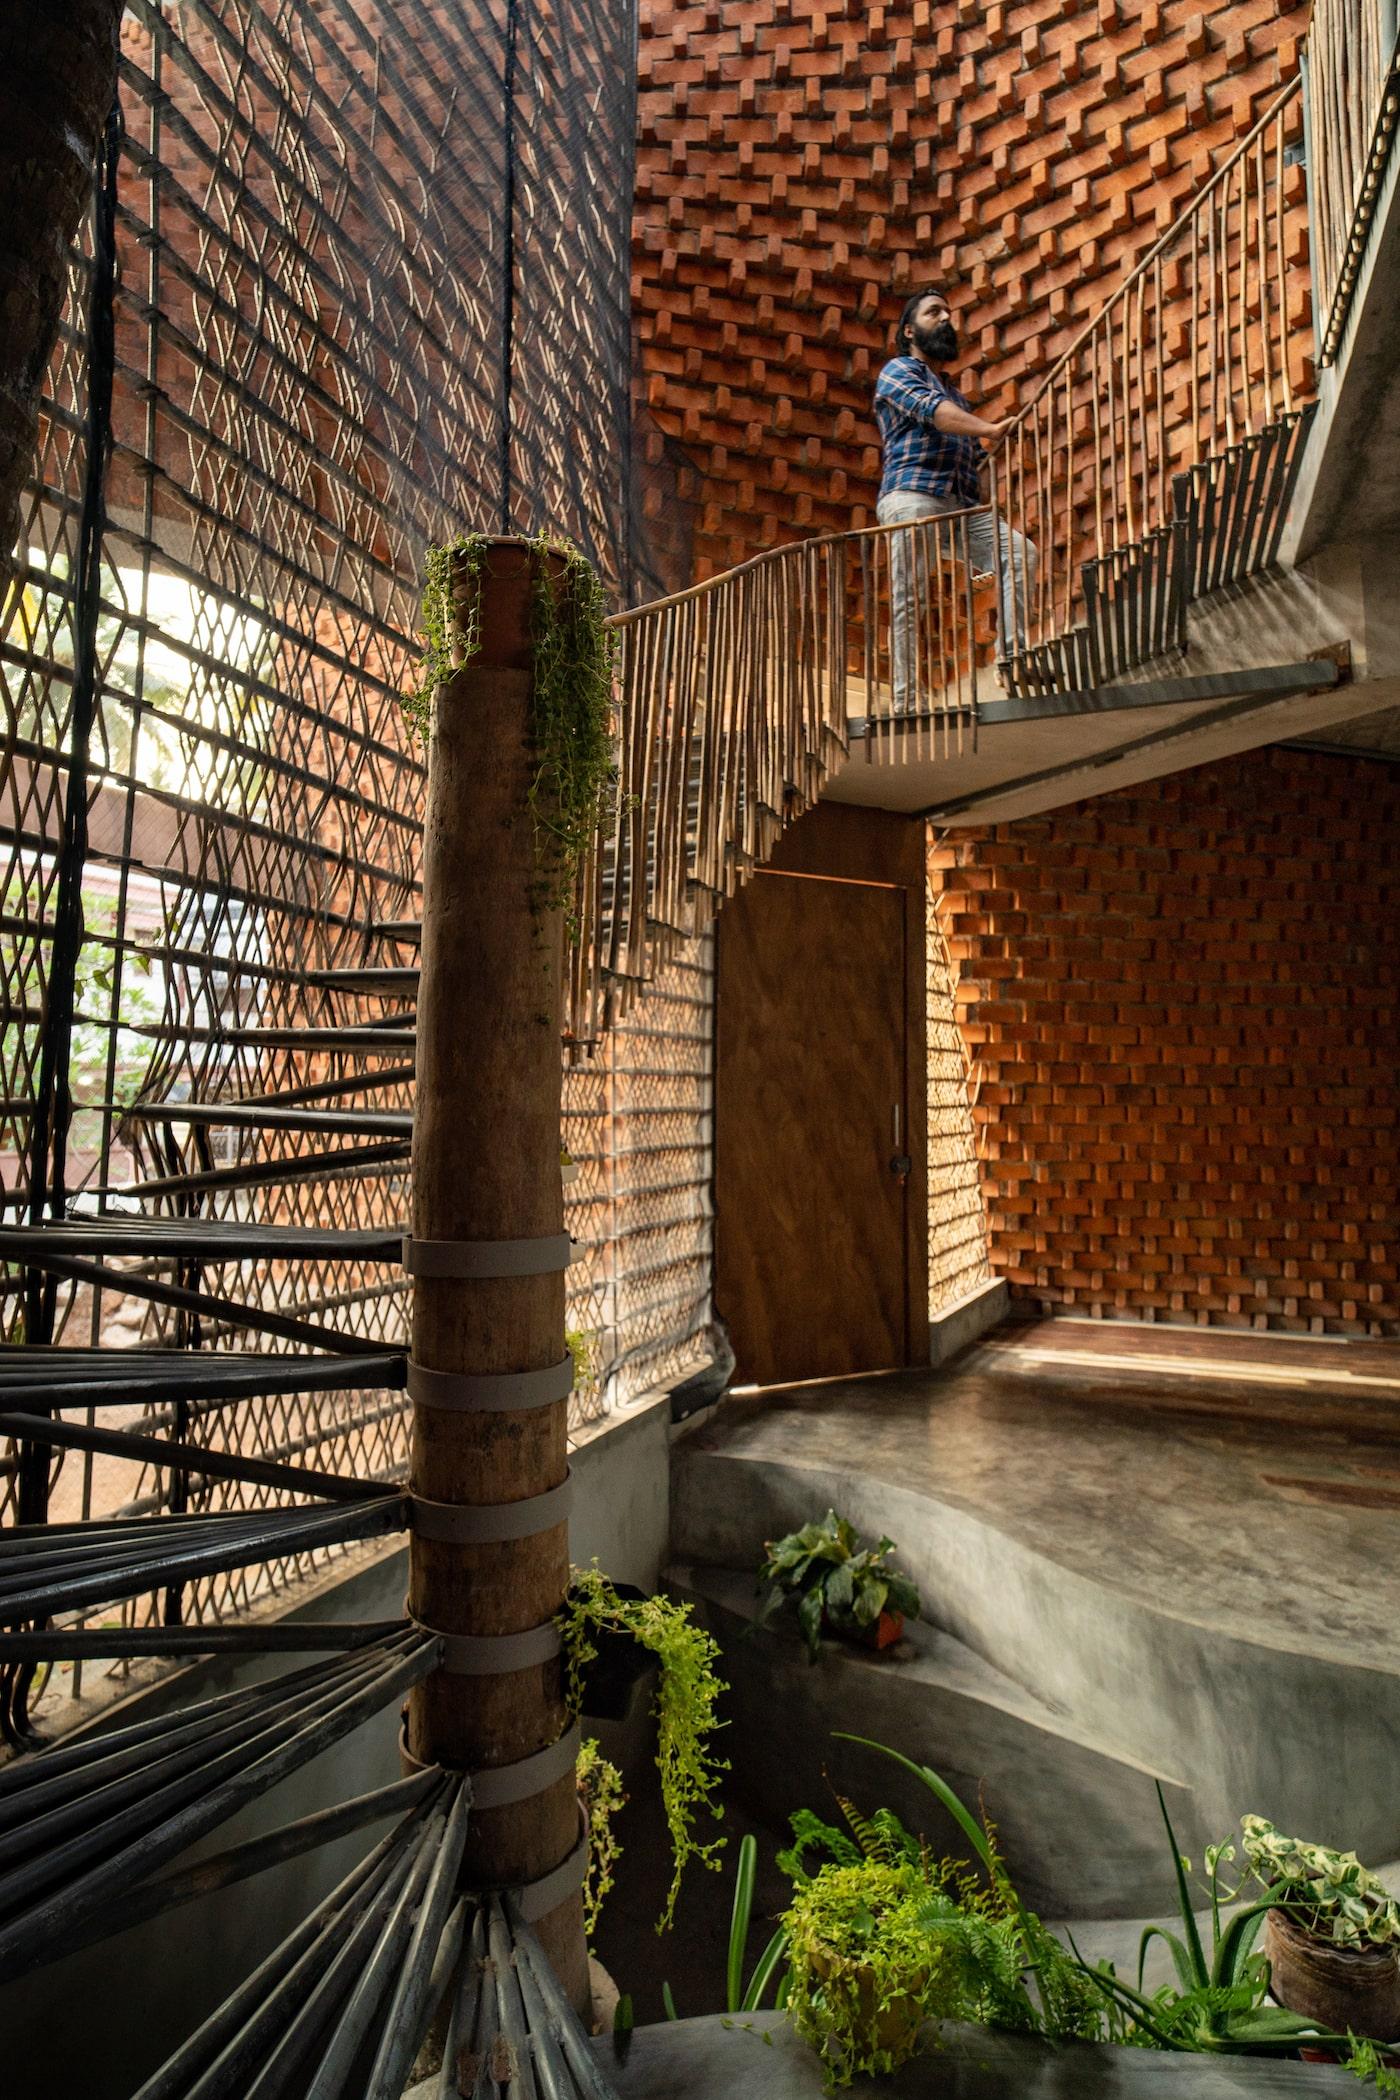 Man walking up metal stairs in brick home